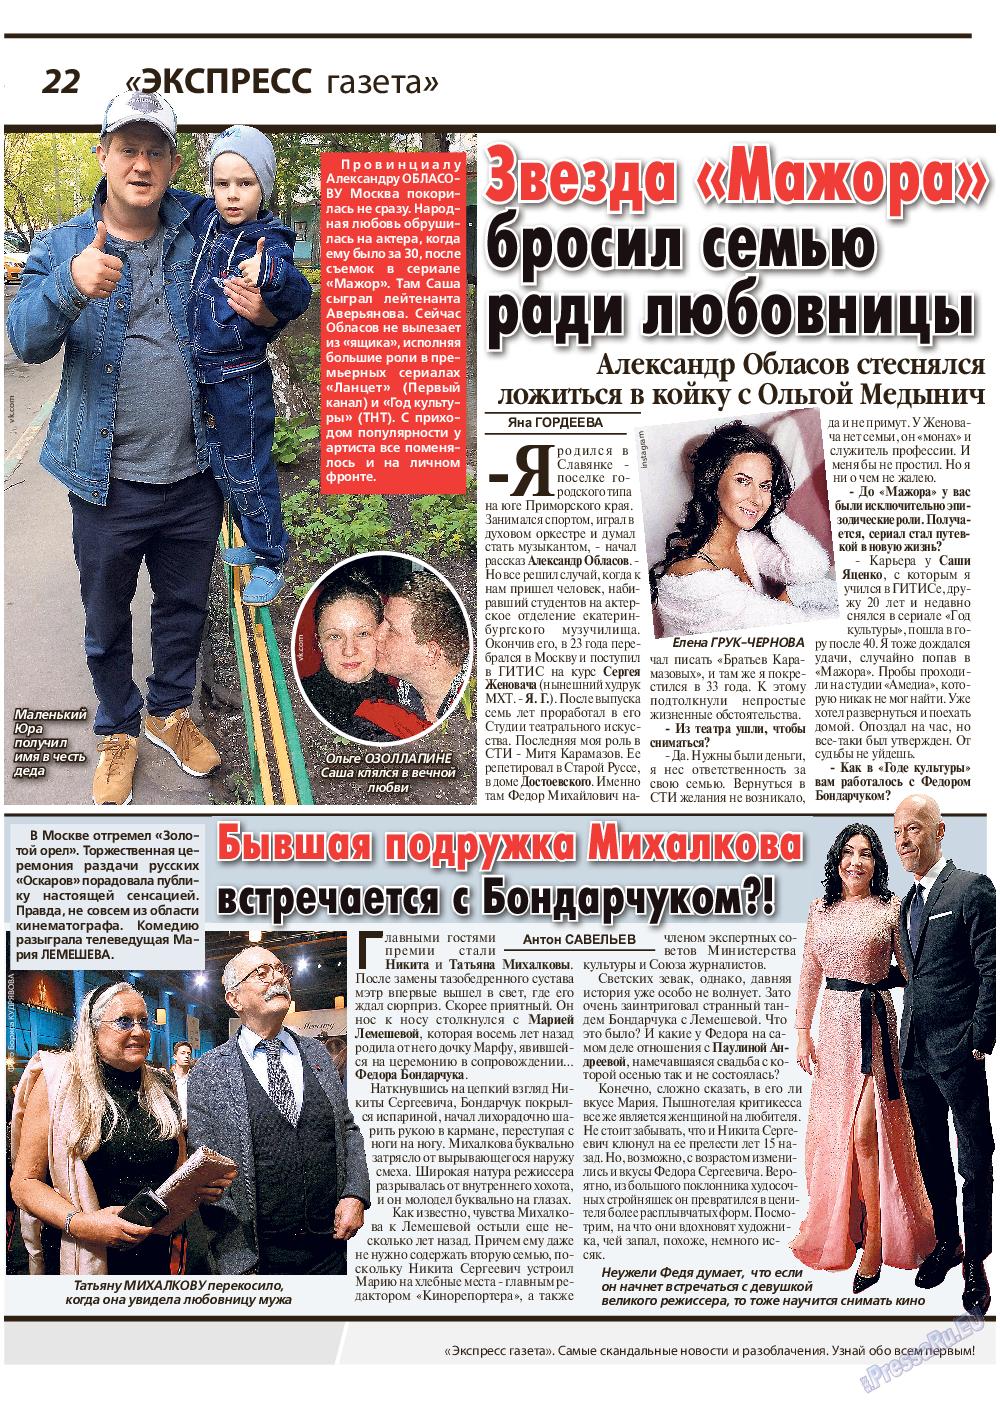 Экспресс газета (газета). 2019 год, номер 3, стр. 22